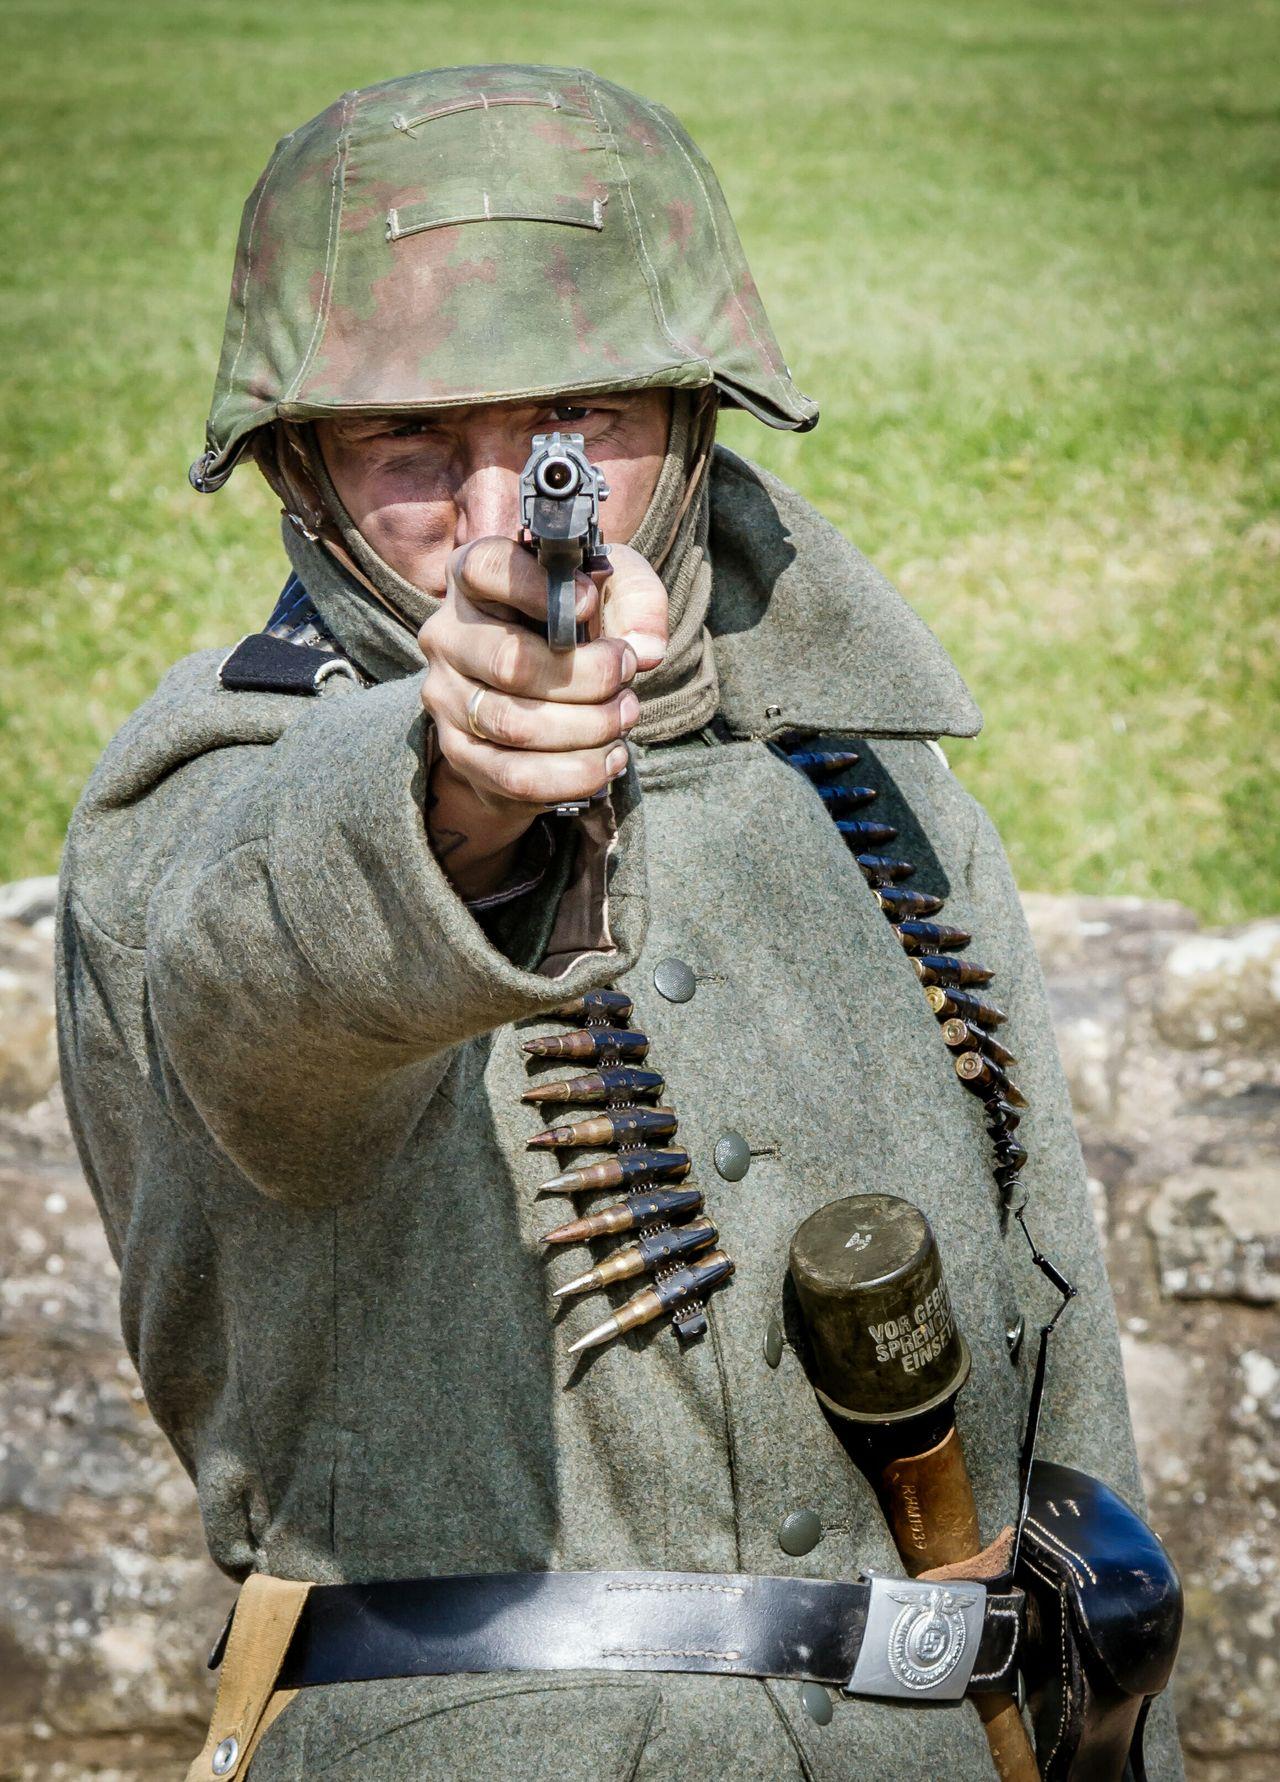 German World War 2 soldier (re-enactor) taken during a shoot last week at Tutbury Castle, Uk. Portrait Soldier World War 2 German Soldier Portrait Photography Portrait Of A Man  Camouflage Gun German Germany Deutchland Manchester